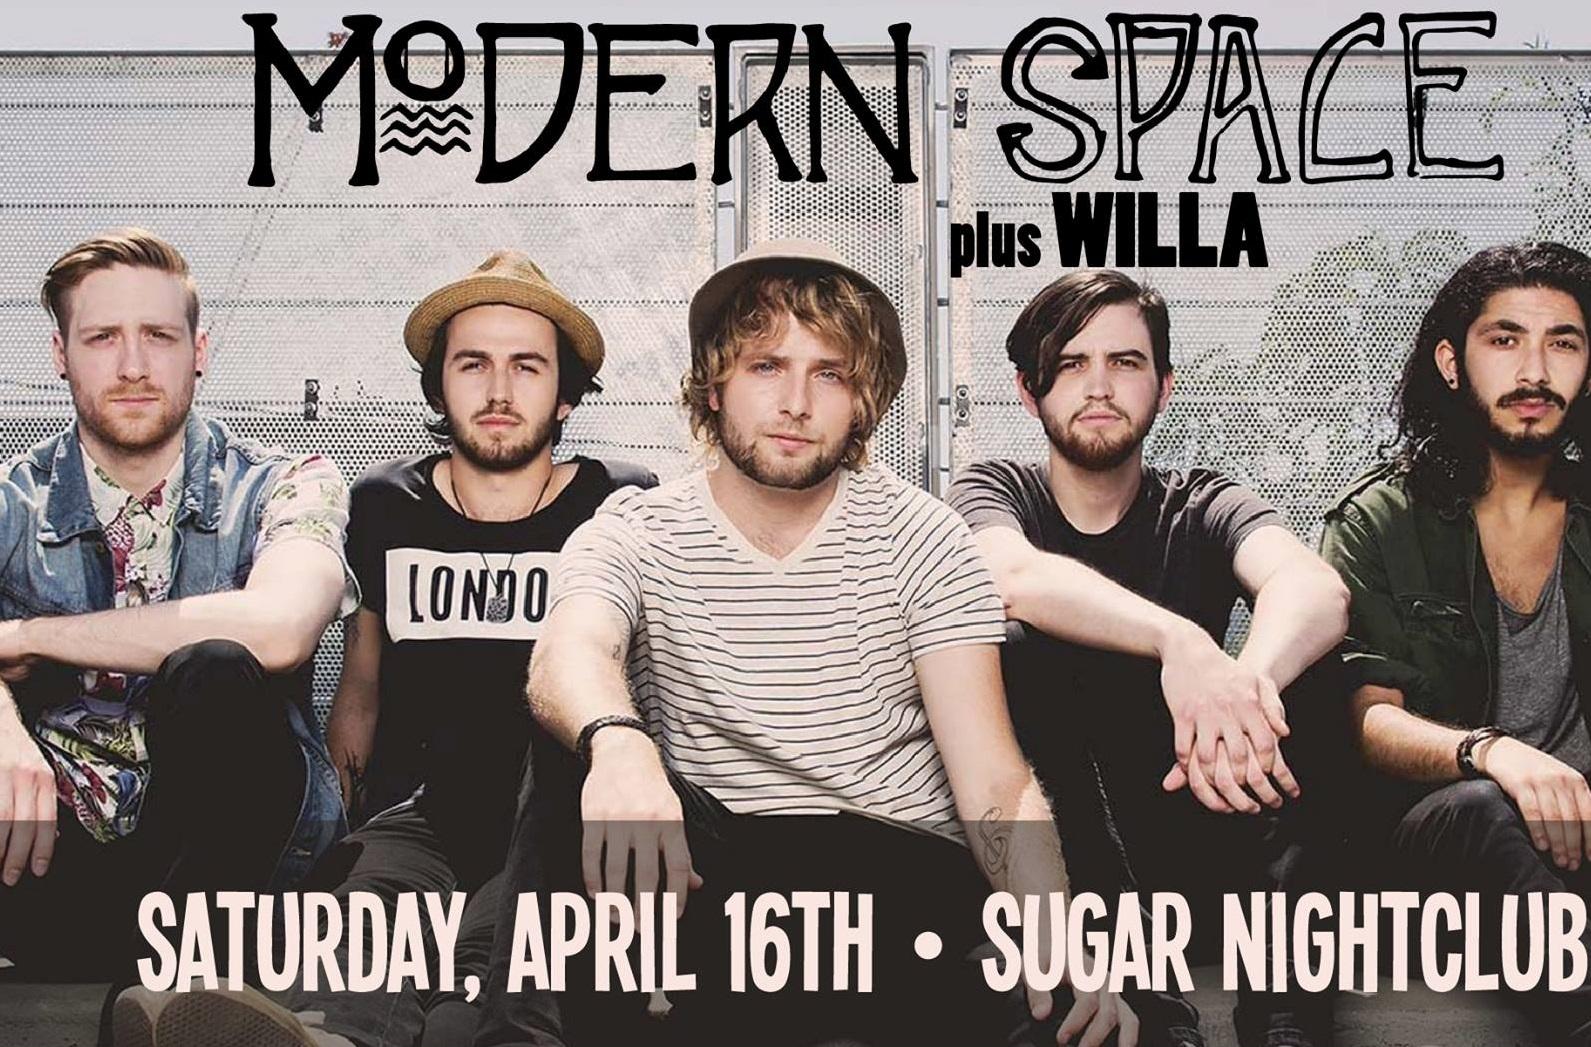 Concert Watch: Modern Space at Sugar Nightclub, April 16th